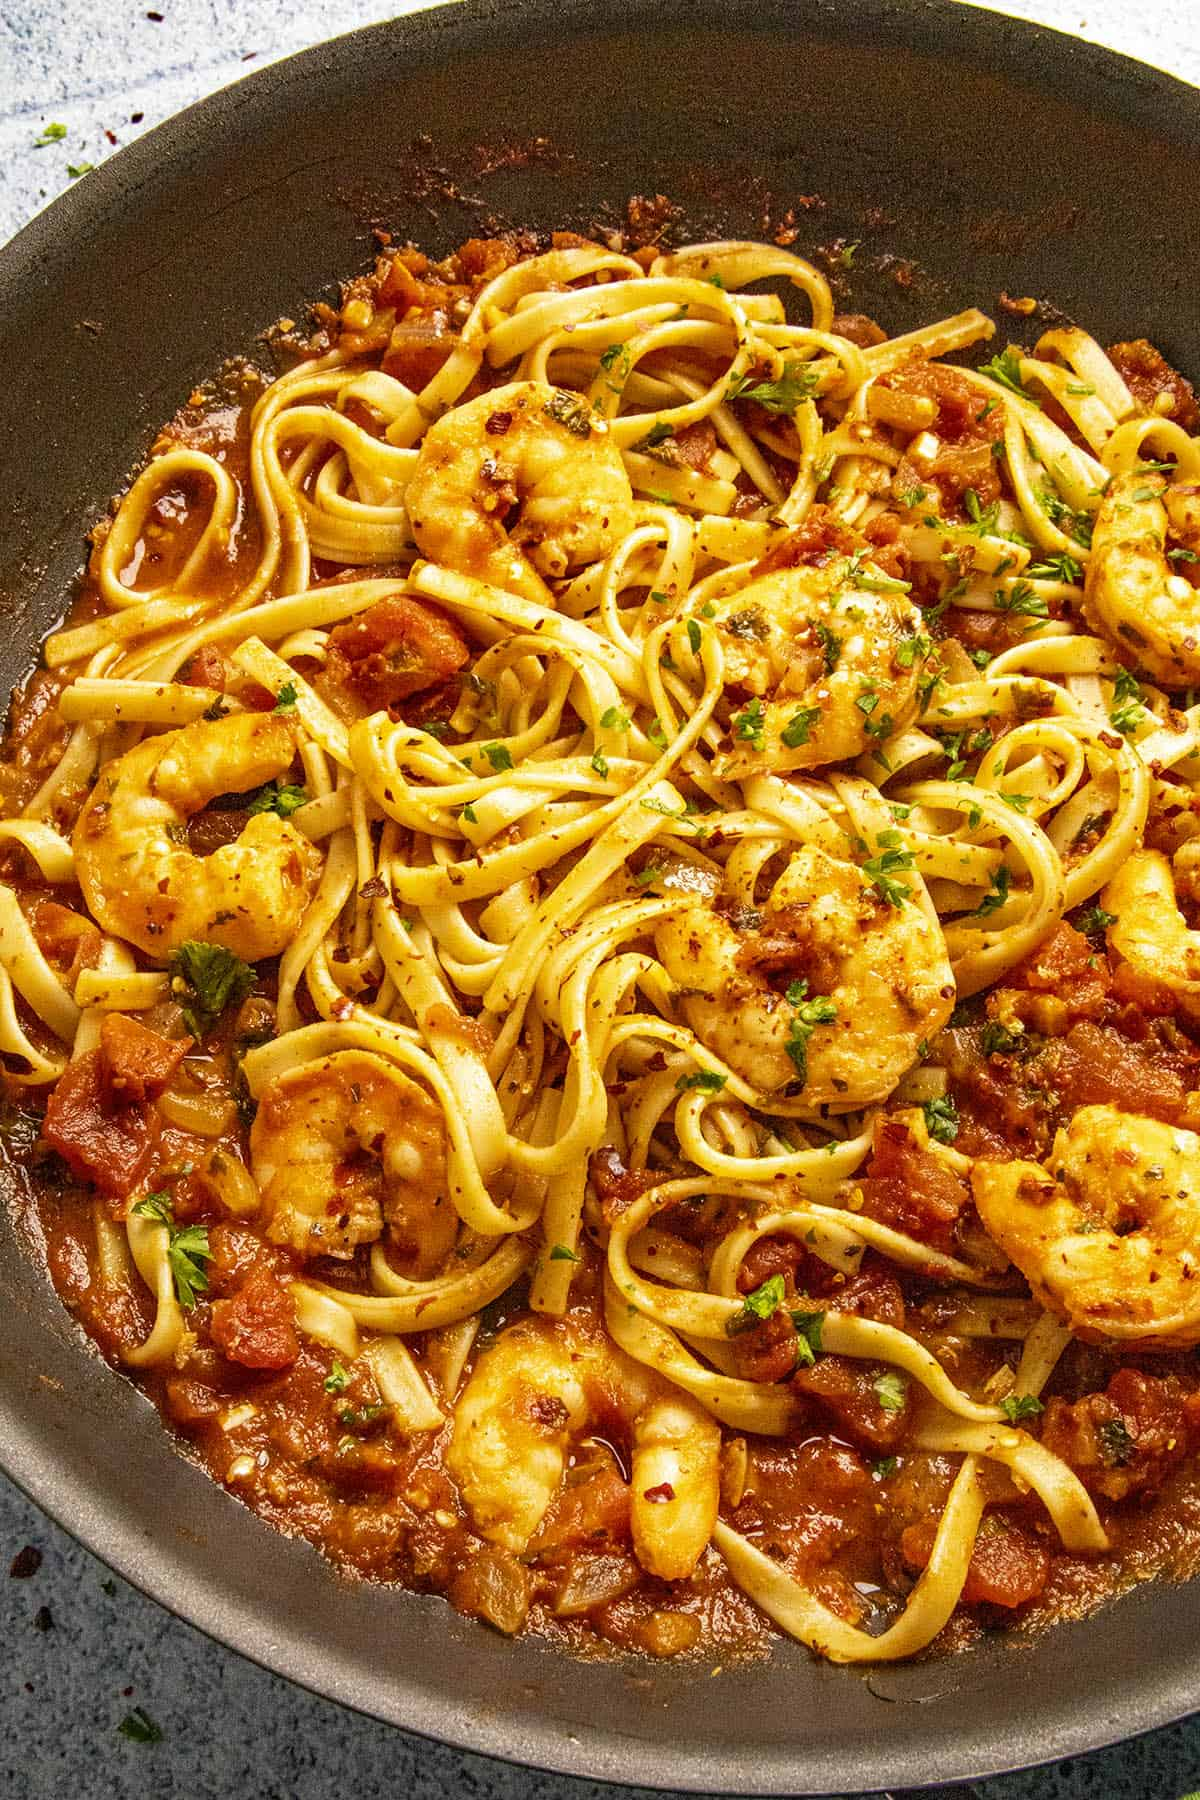 Shrimp Fra Diavolo in a pan